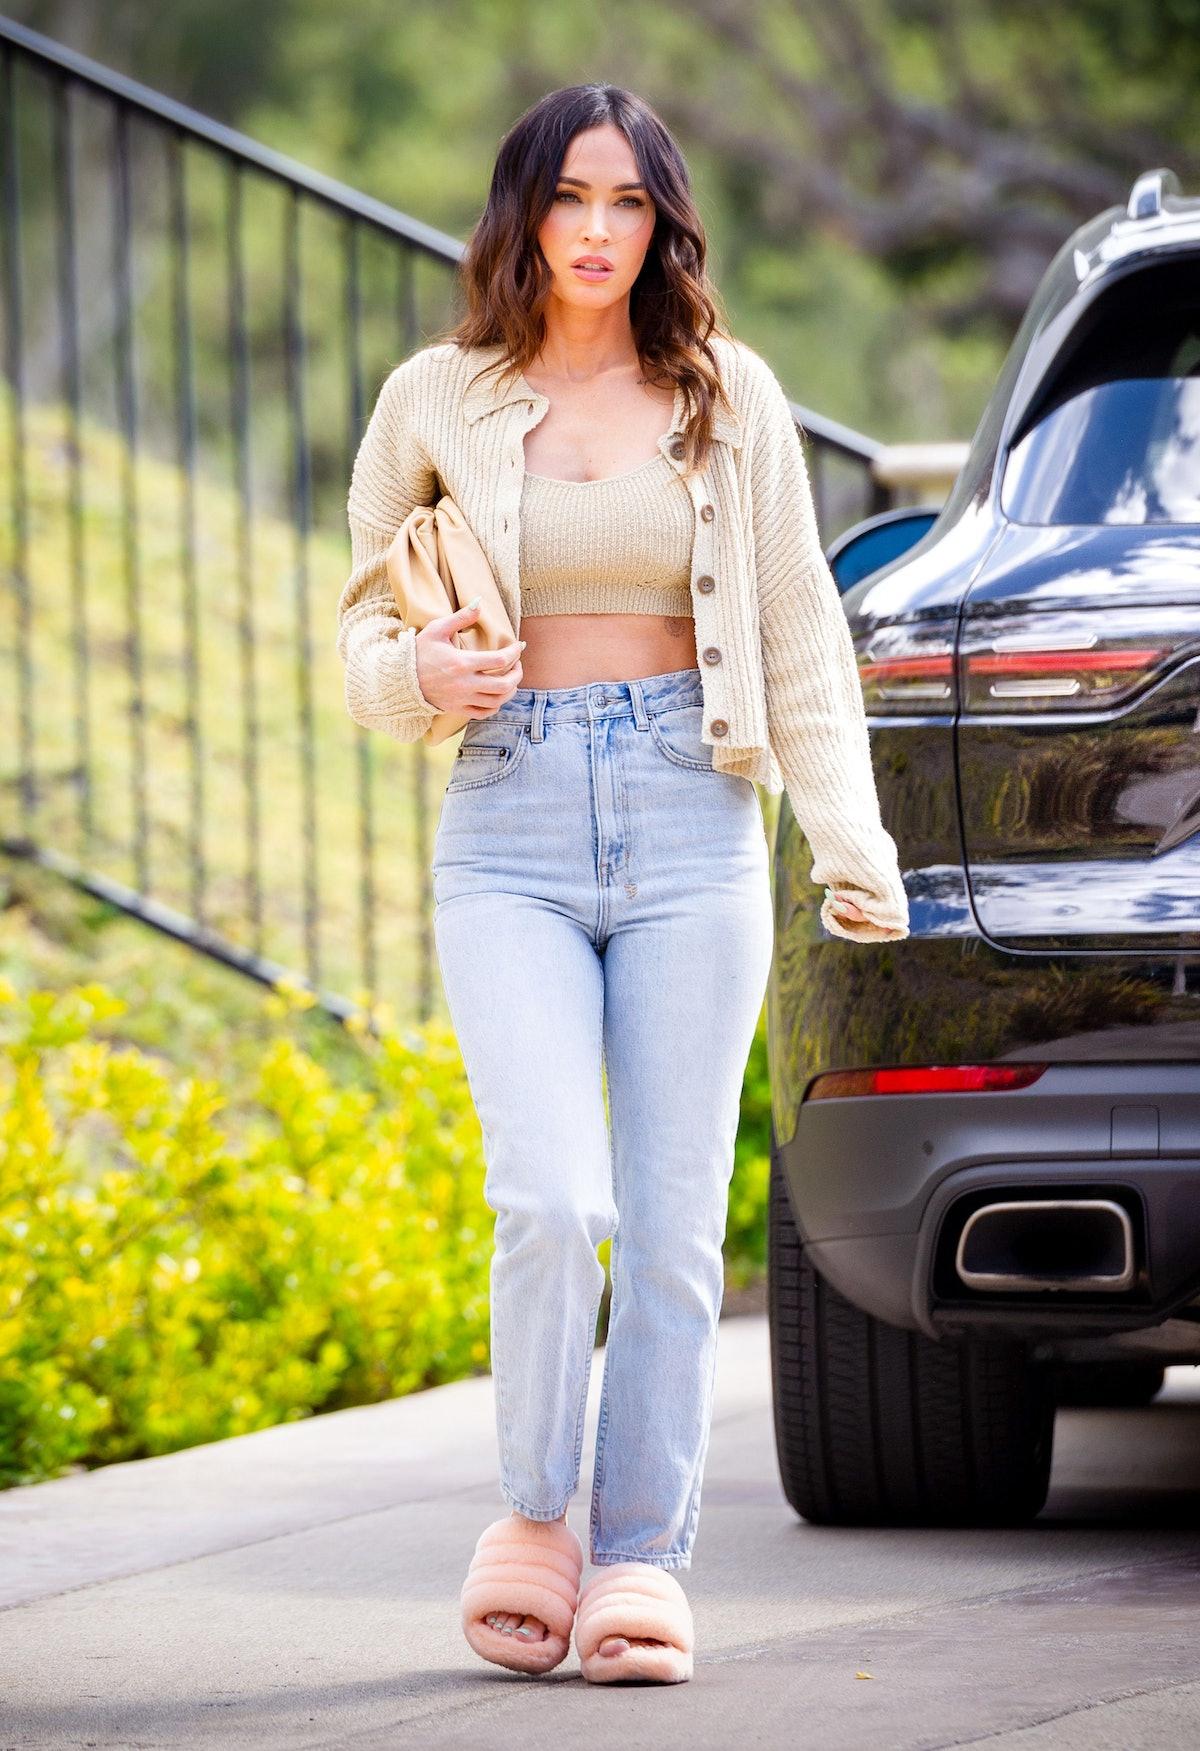 Actress Megan Fox is seen on April 01, 2021 in Los Angeles, California.